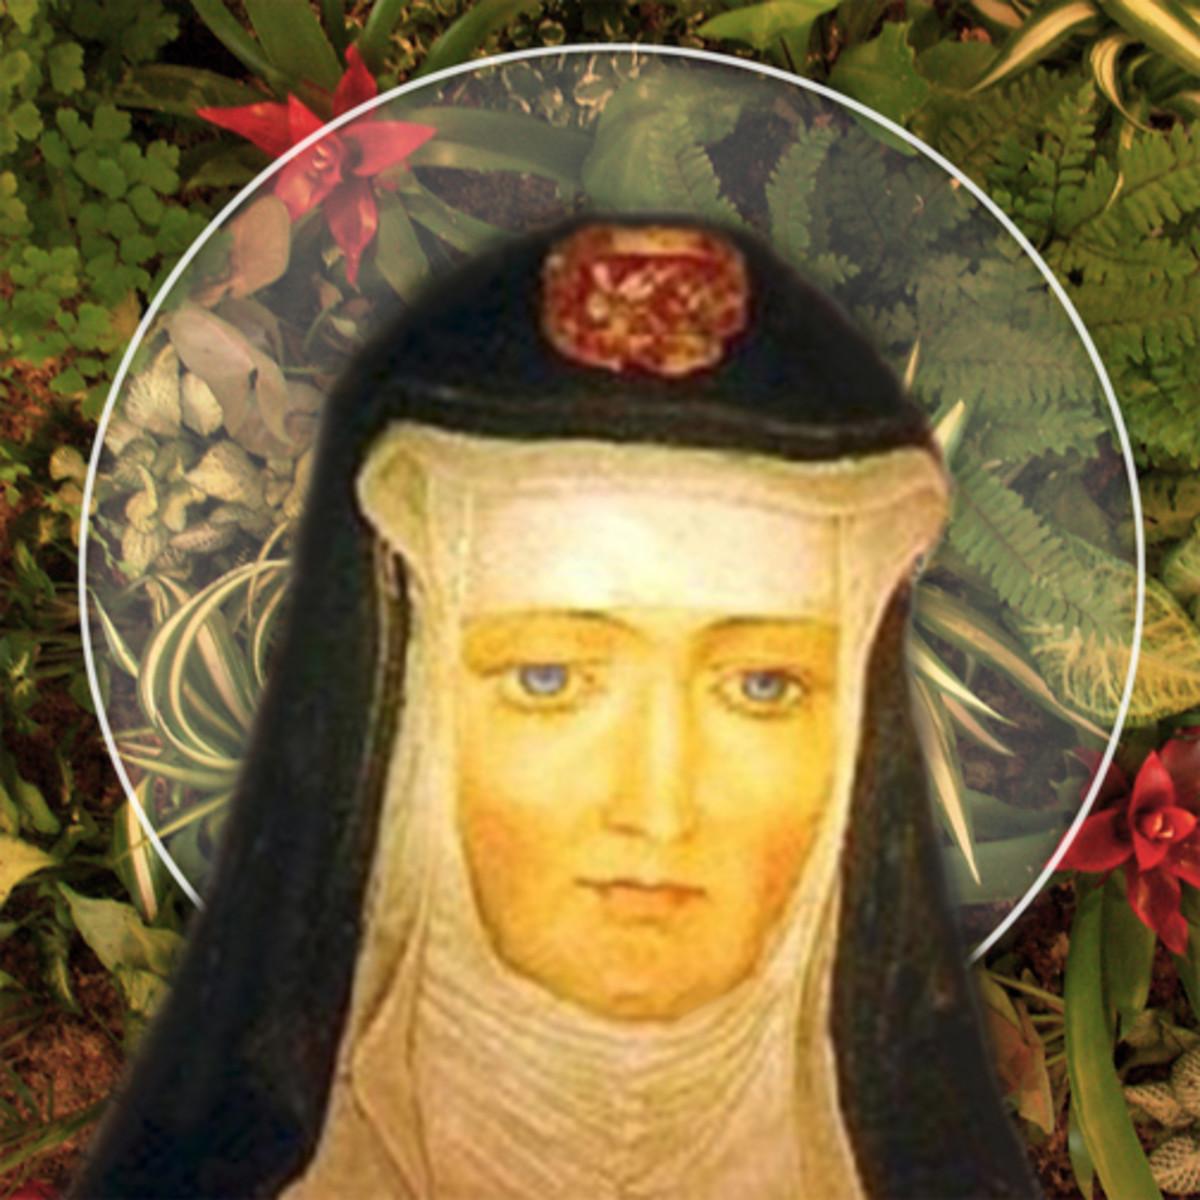 St. Hildegard of Bingen, a flourishing garden